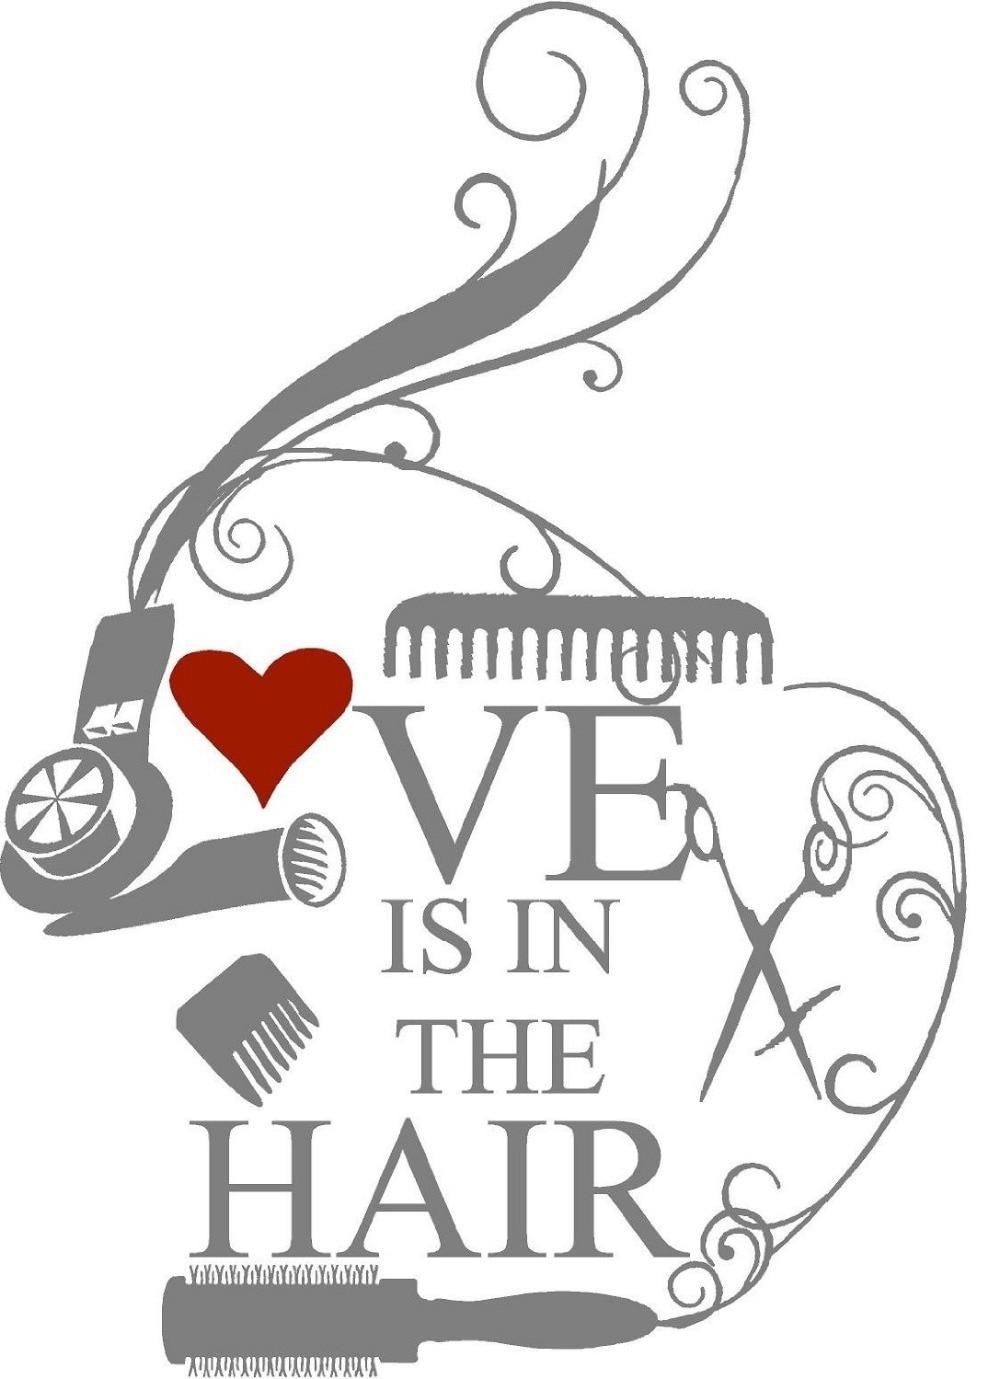 Hair Salon Vinyl Wall Decal Barbershop Scissors Hairdryer ...